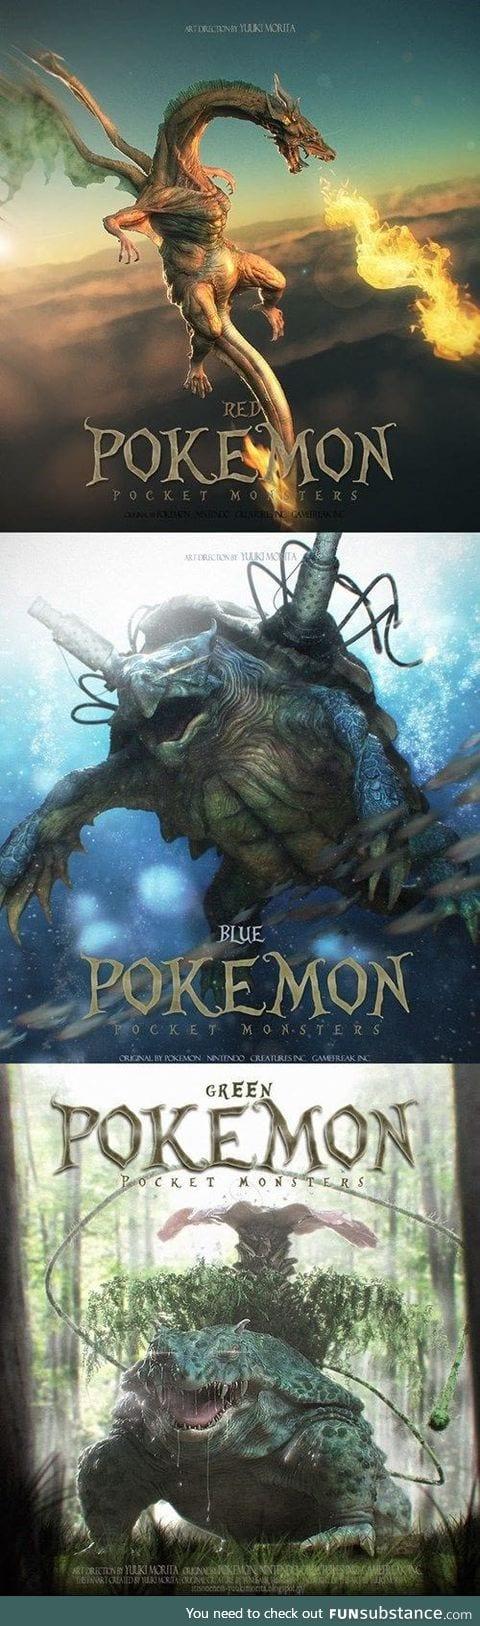 Real life Pokemon movie